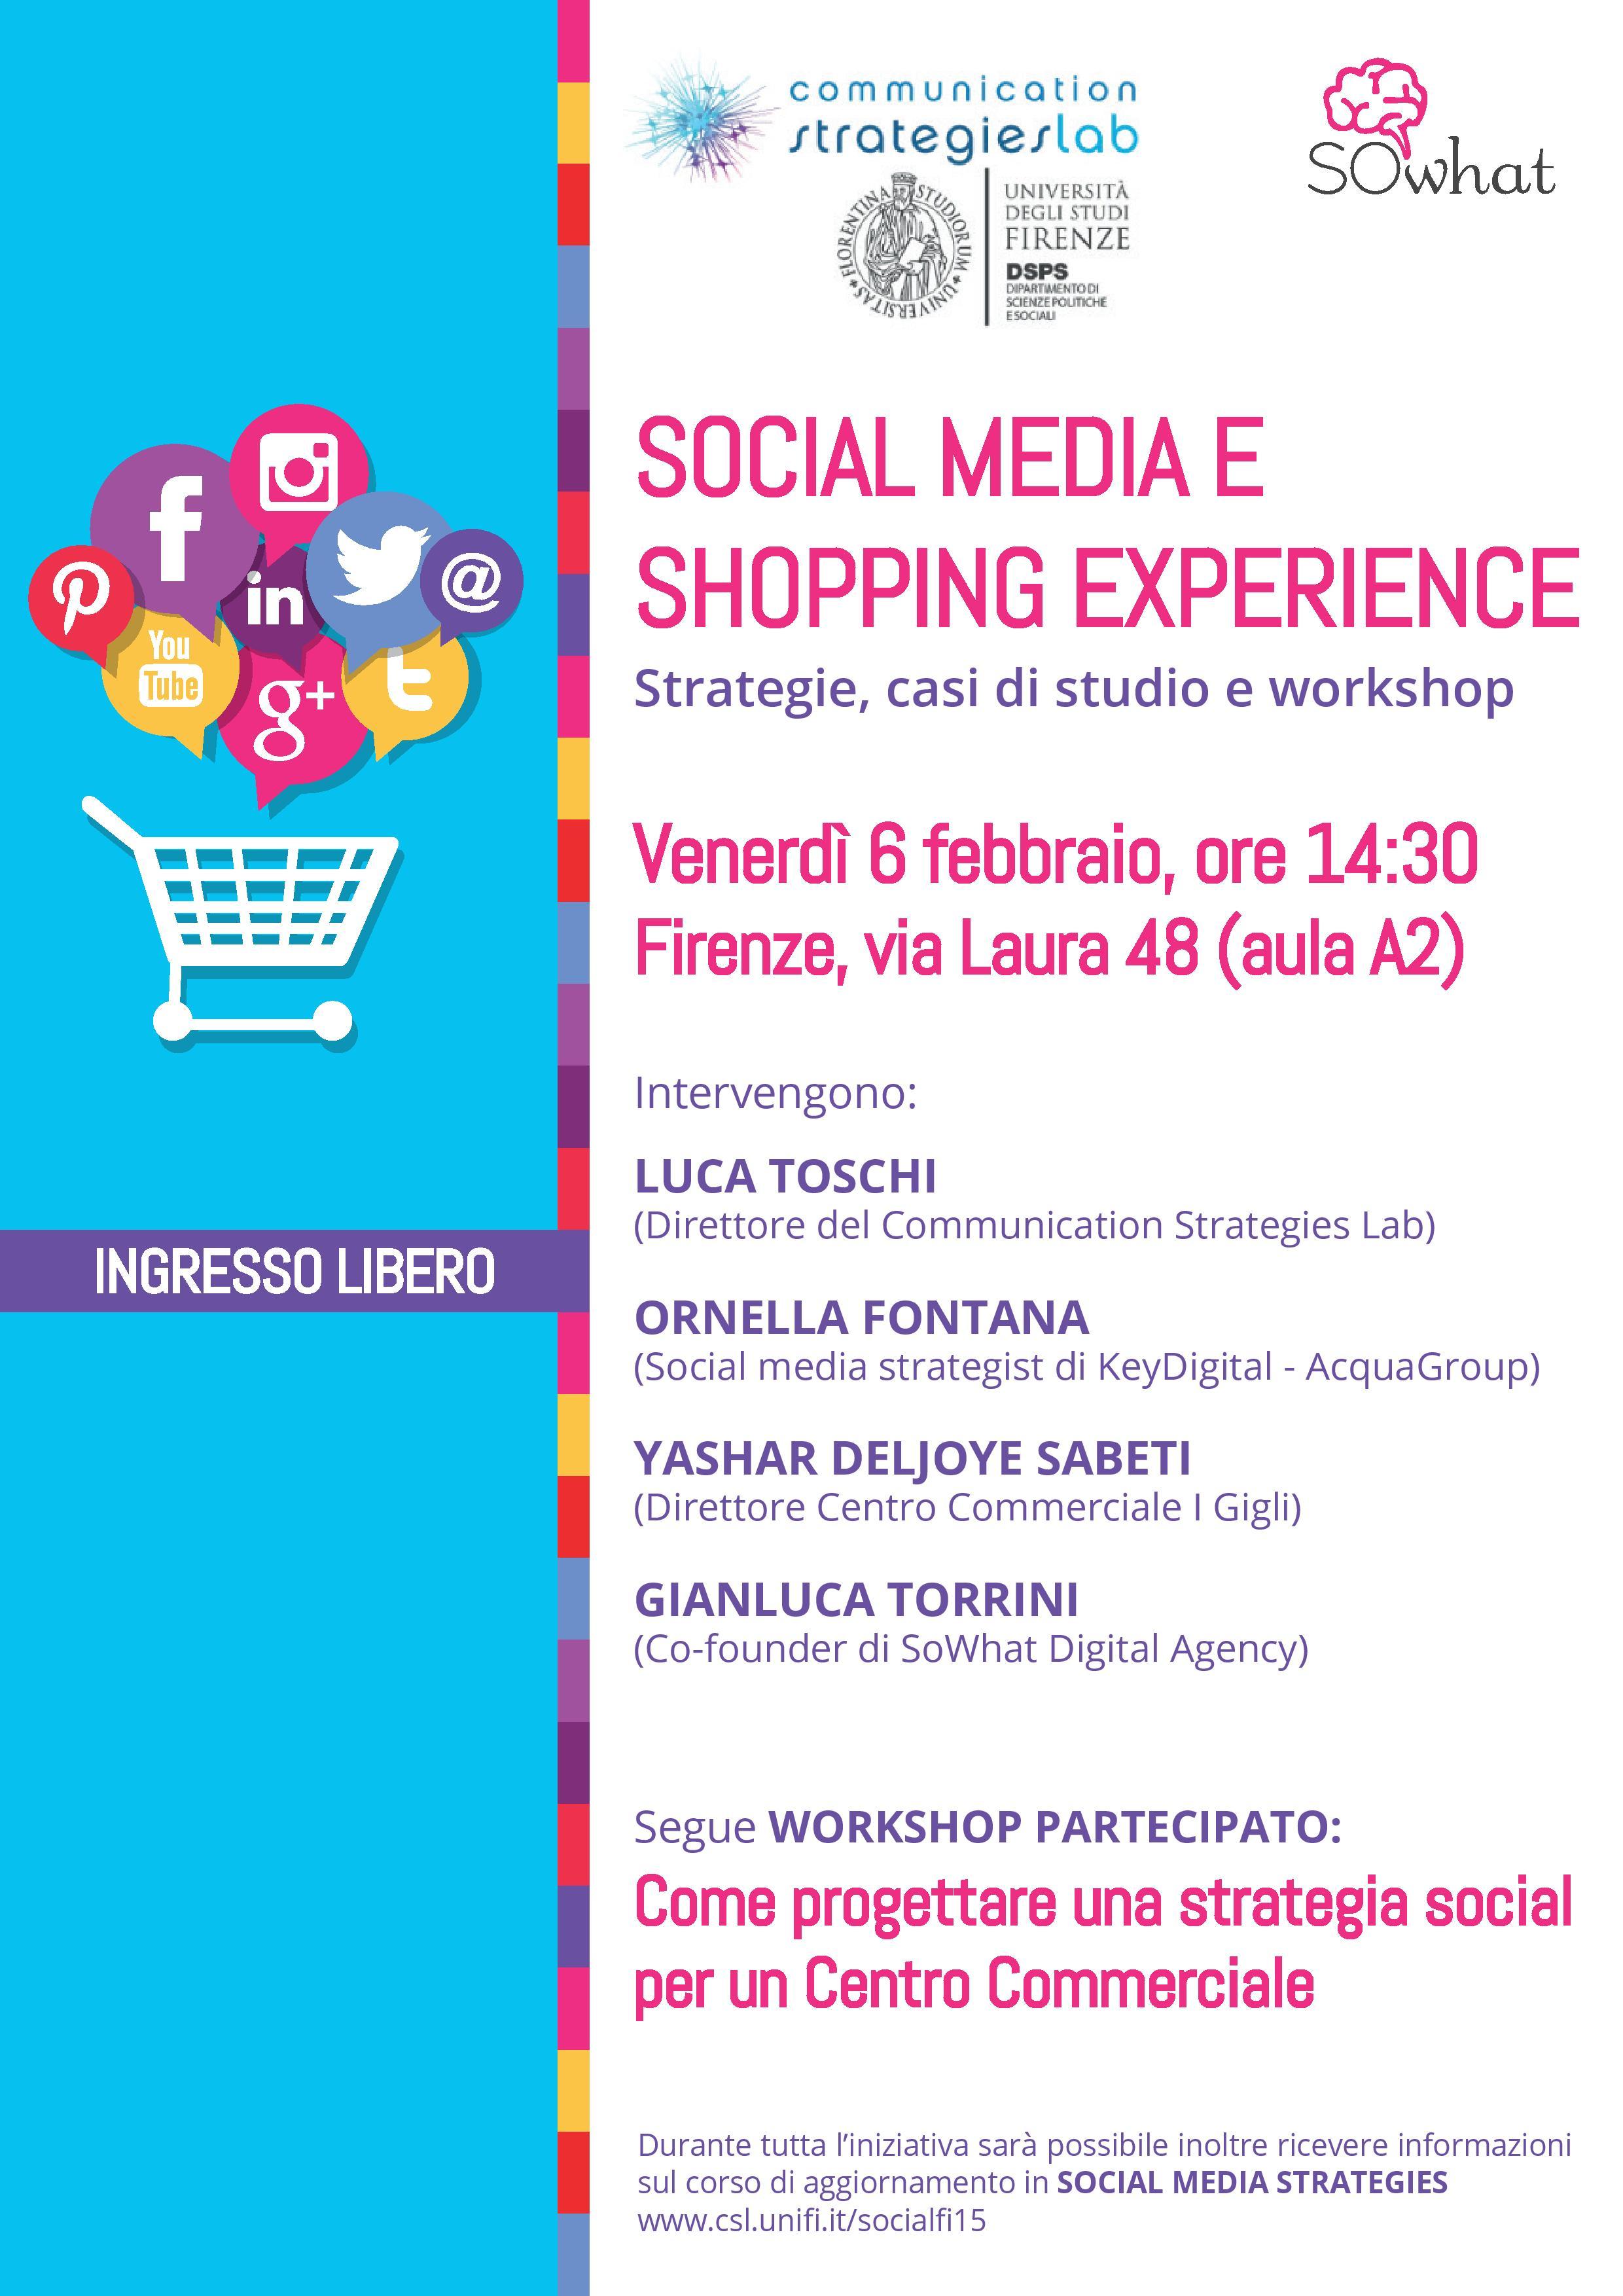 Social Media e Shopping Experience. Strategie, casi di studio e workshop